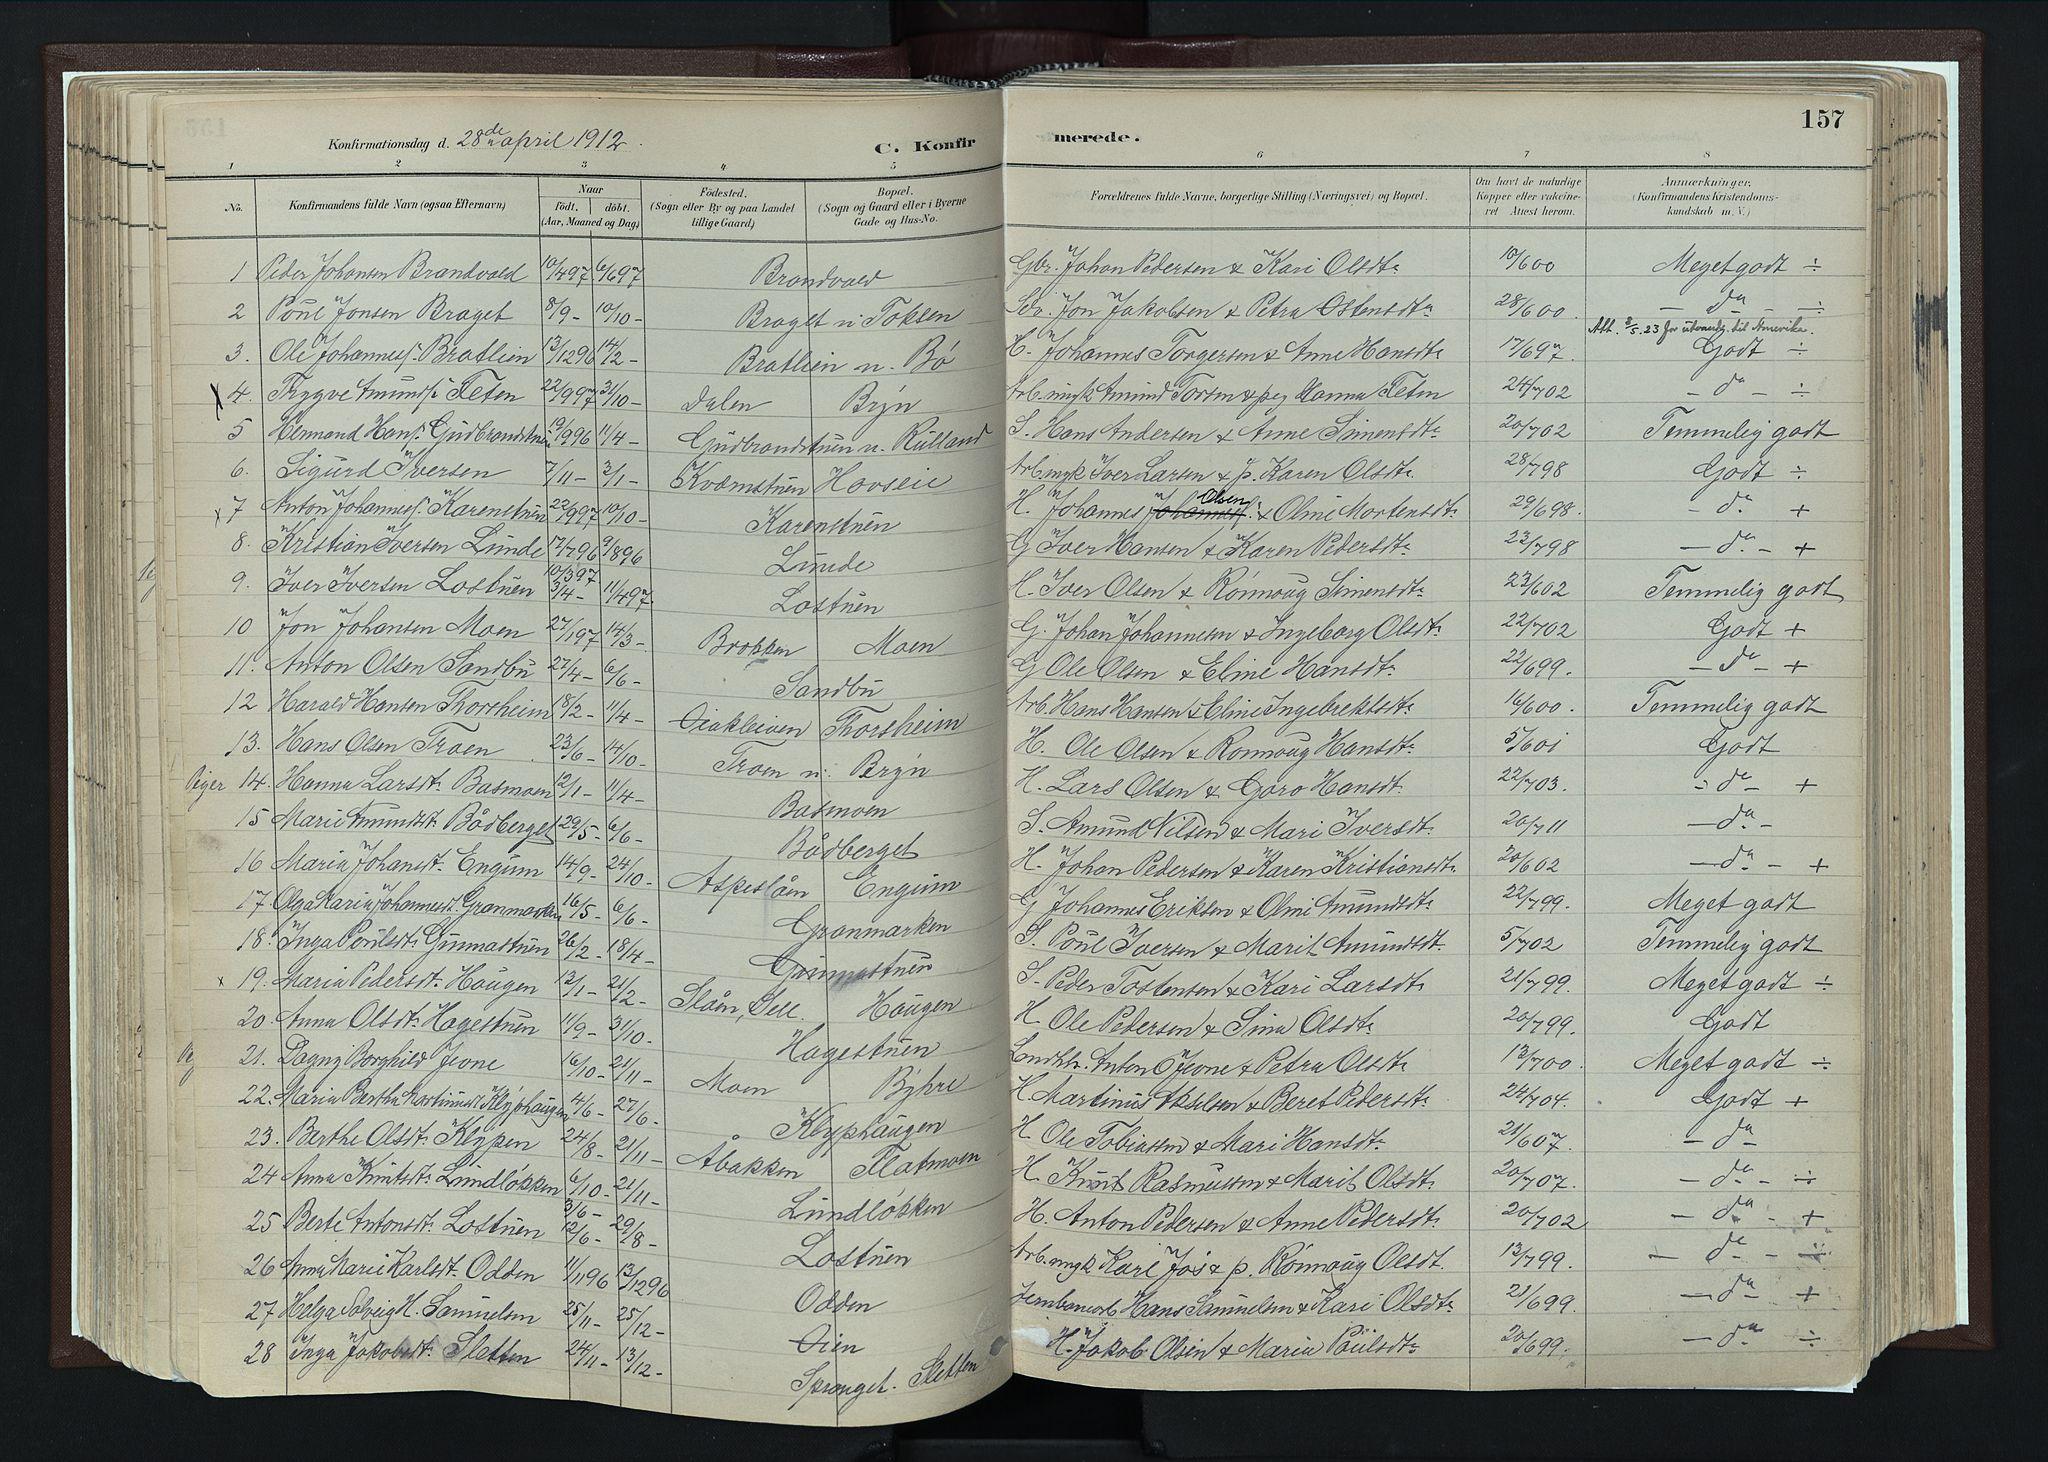 SAH, Nord-Fron prestekontor, Ministerialbok nr. 4, 1884-1914, s. 157